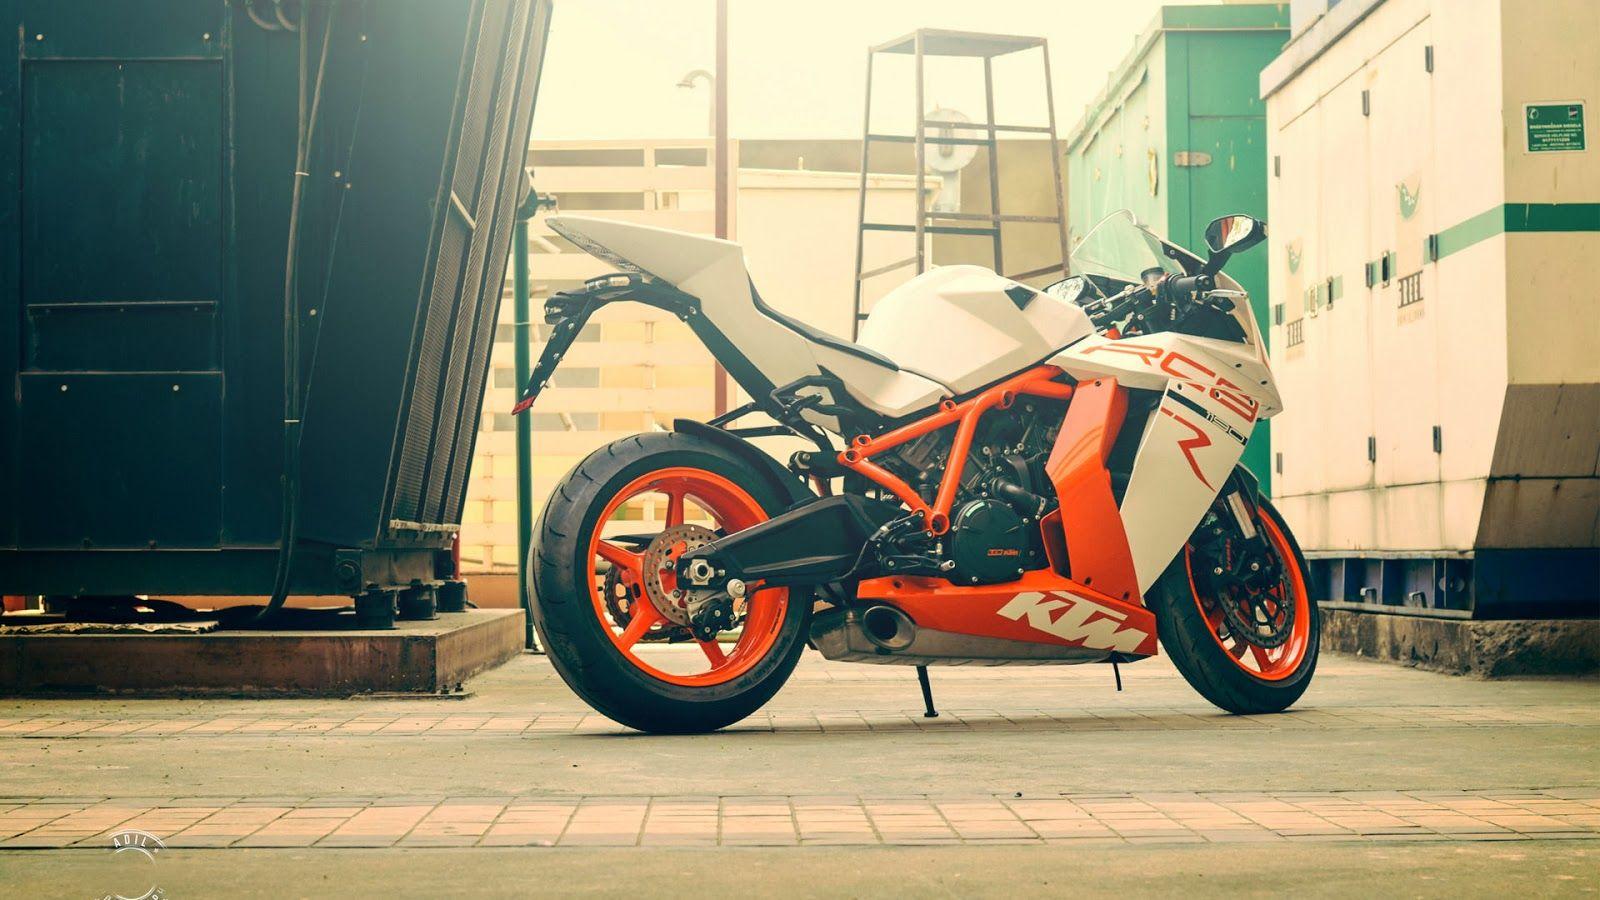 Http Hdwallpapersgalaxy Blogspot Com 2014 02 Ktm 1190 Rc8 Heavy Bike Hd Wallpaper Html Motorcycle Wallpaper Motorcycle Bike